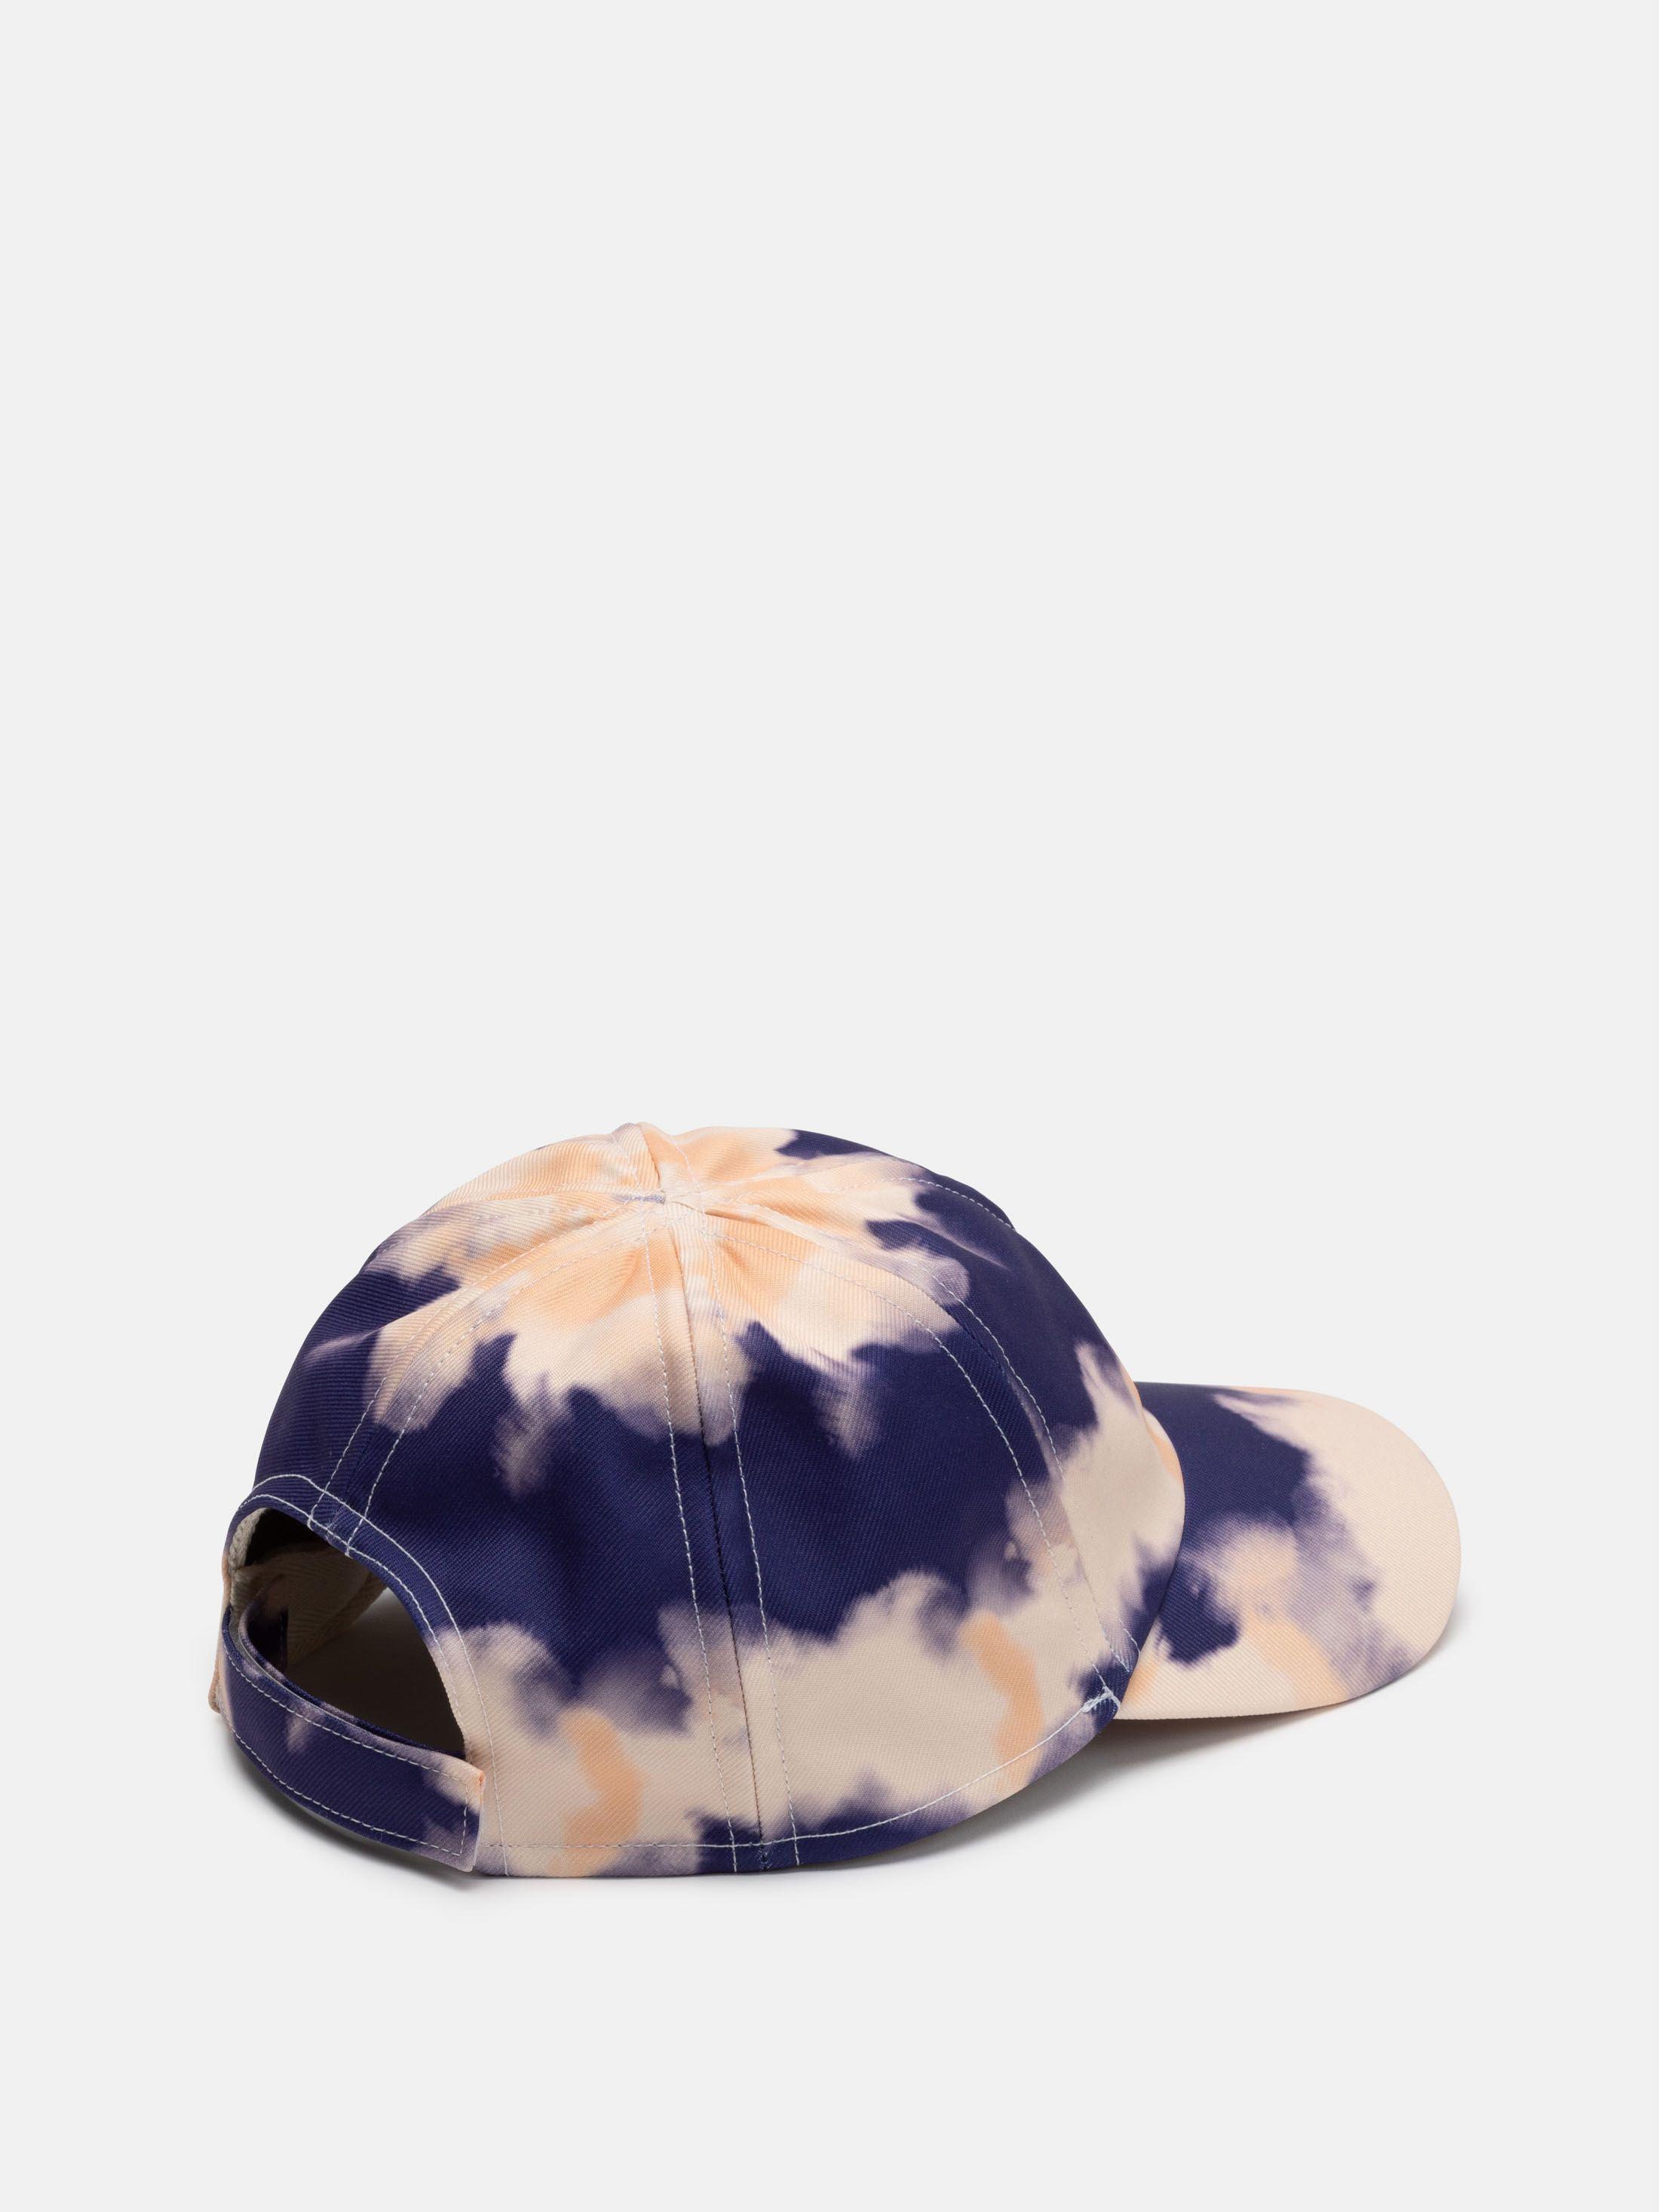 overview detail of customizable baseball cap